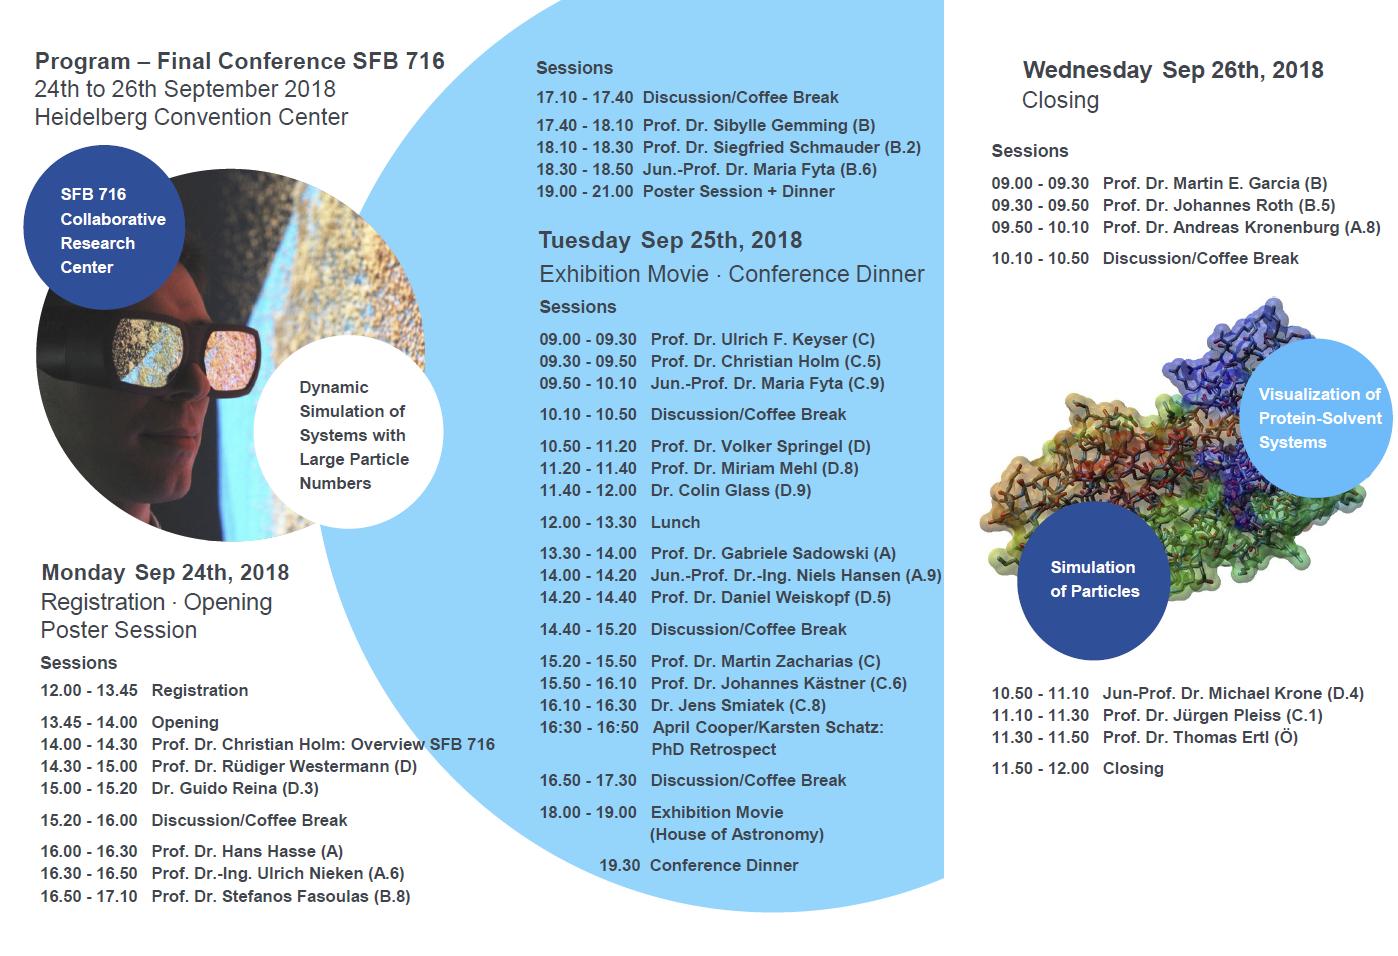 sfb716_Conference_Program_2018